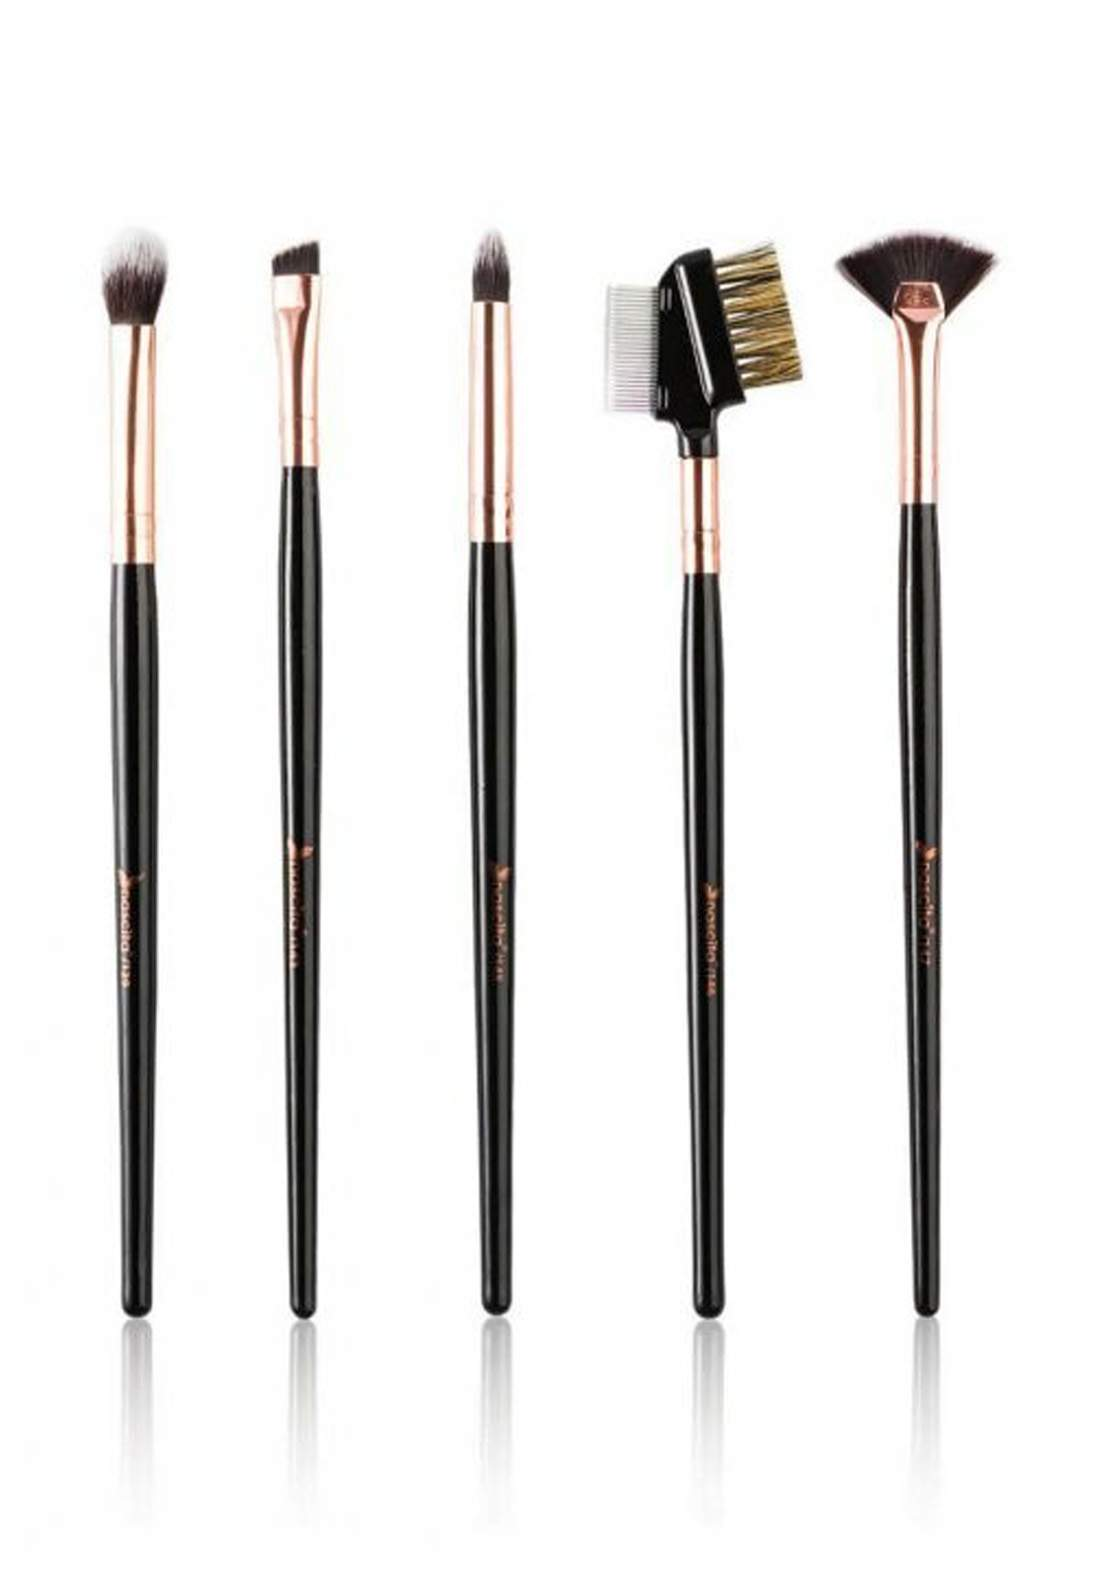 Nascita set13 Make Up Addict Eye Brush Set 5Pcs سيت فرش مكياج